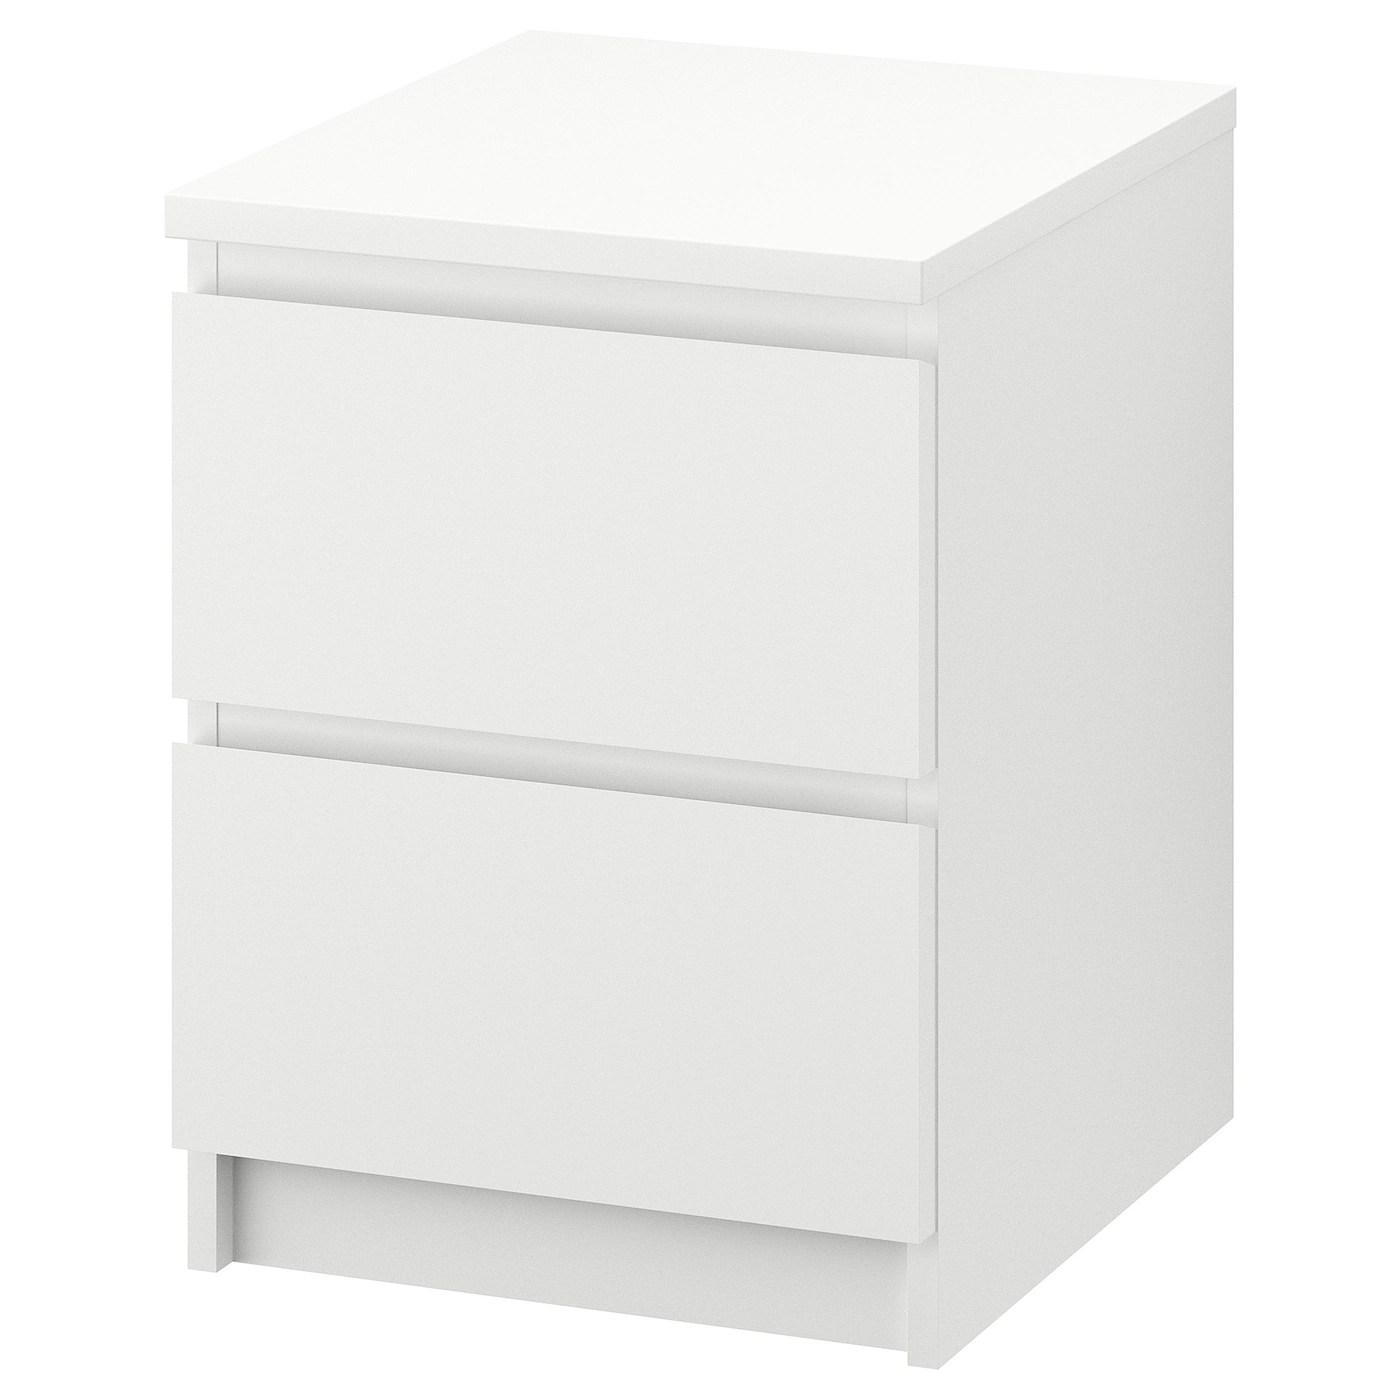 Short White Chest Drawers